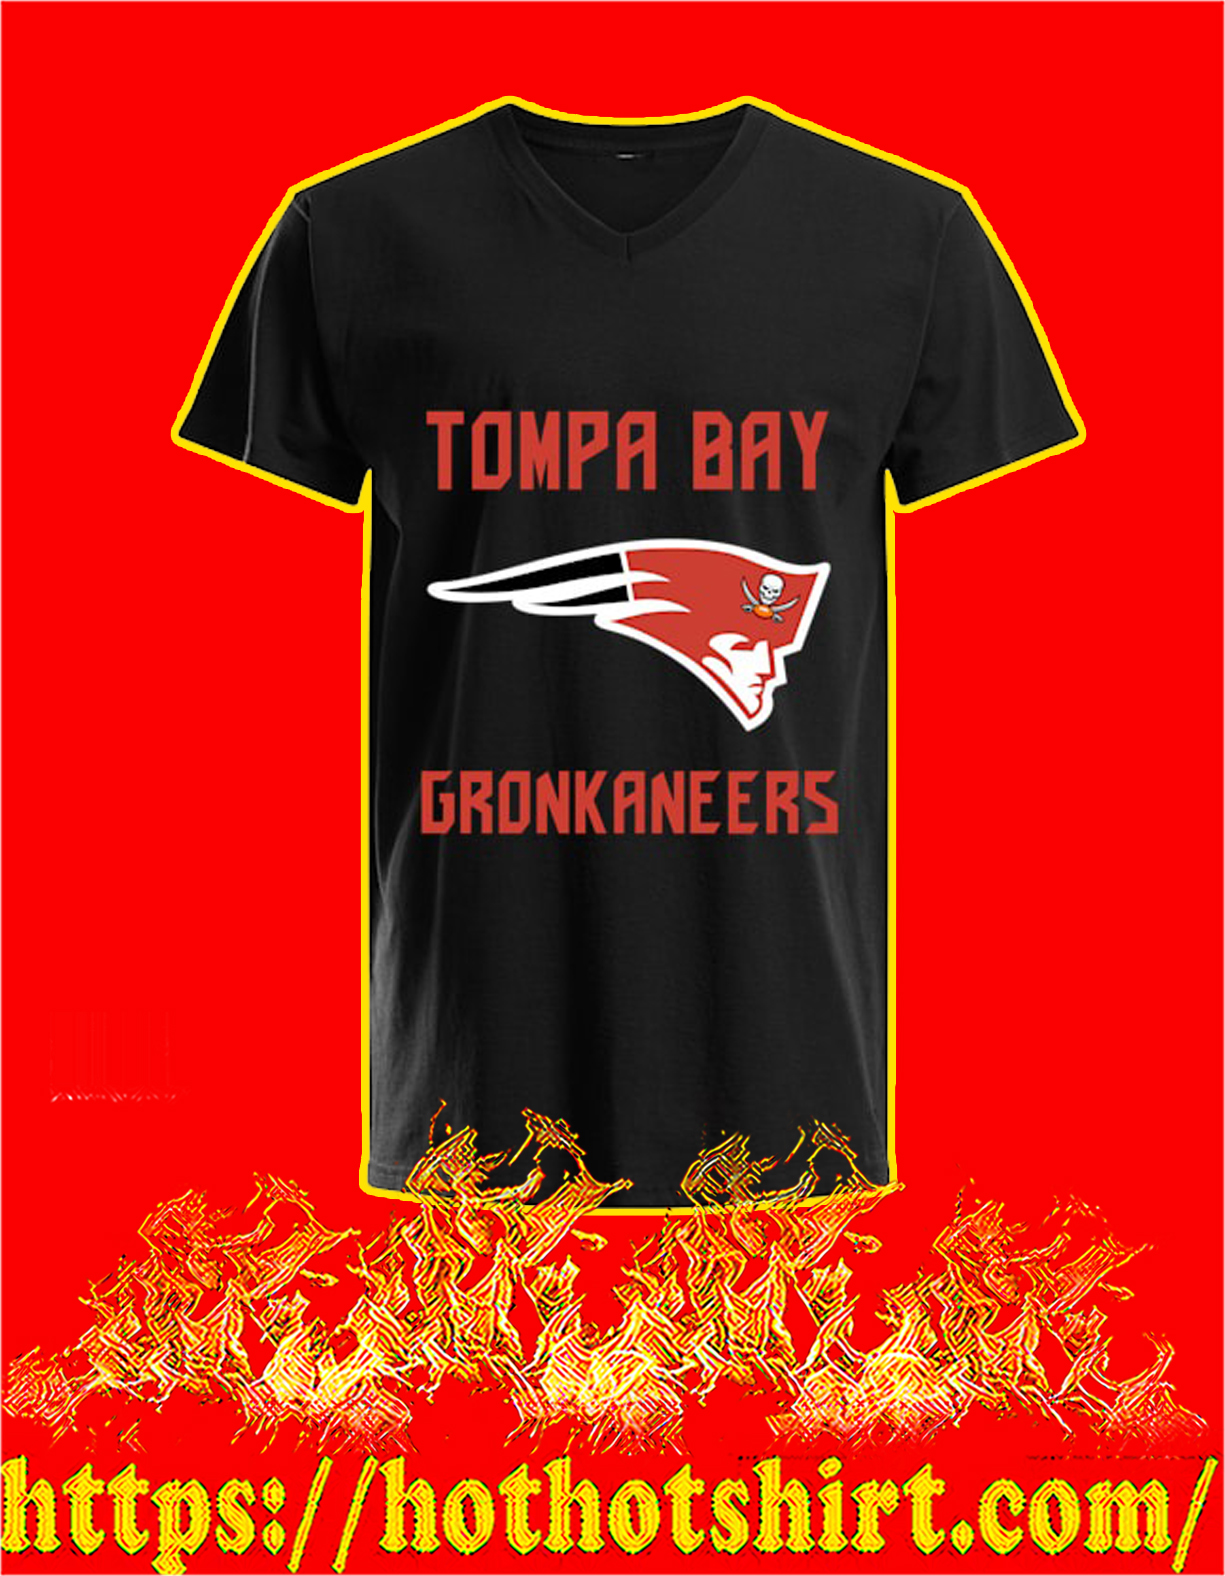 Tompa bay gronkaneers v-neck